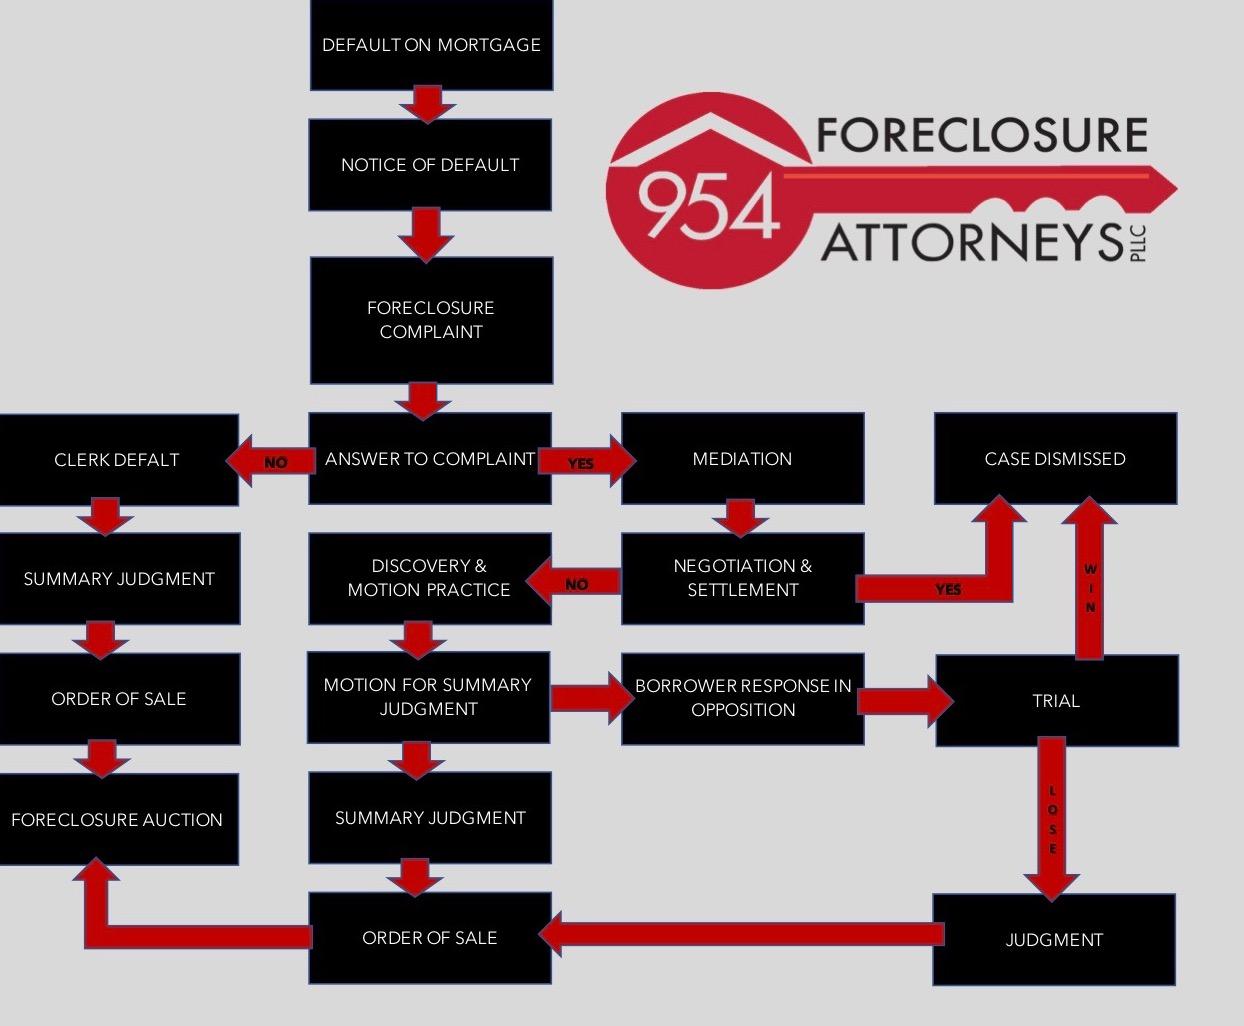 Florida Foreclosure Process